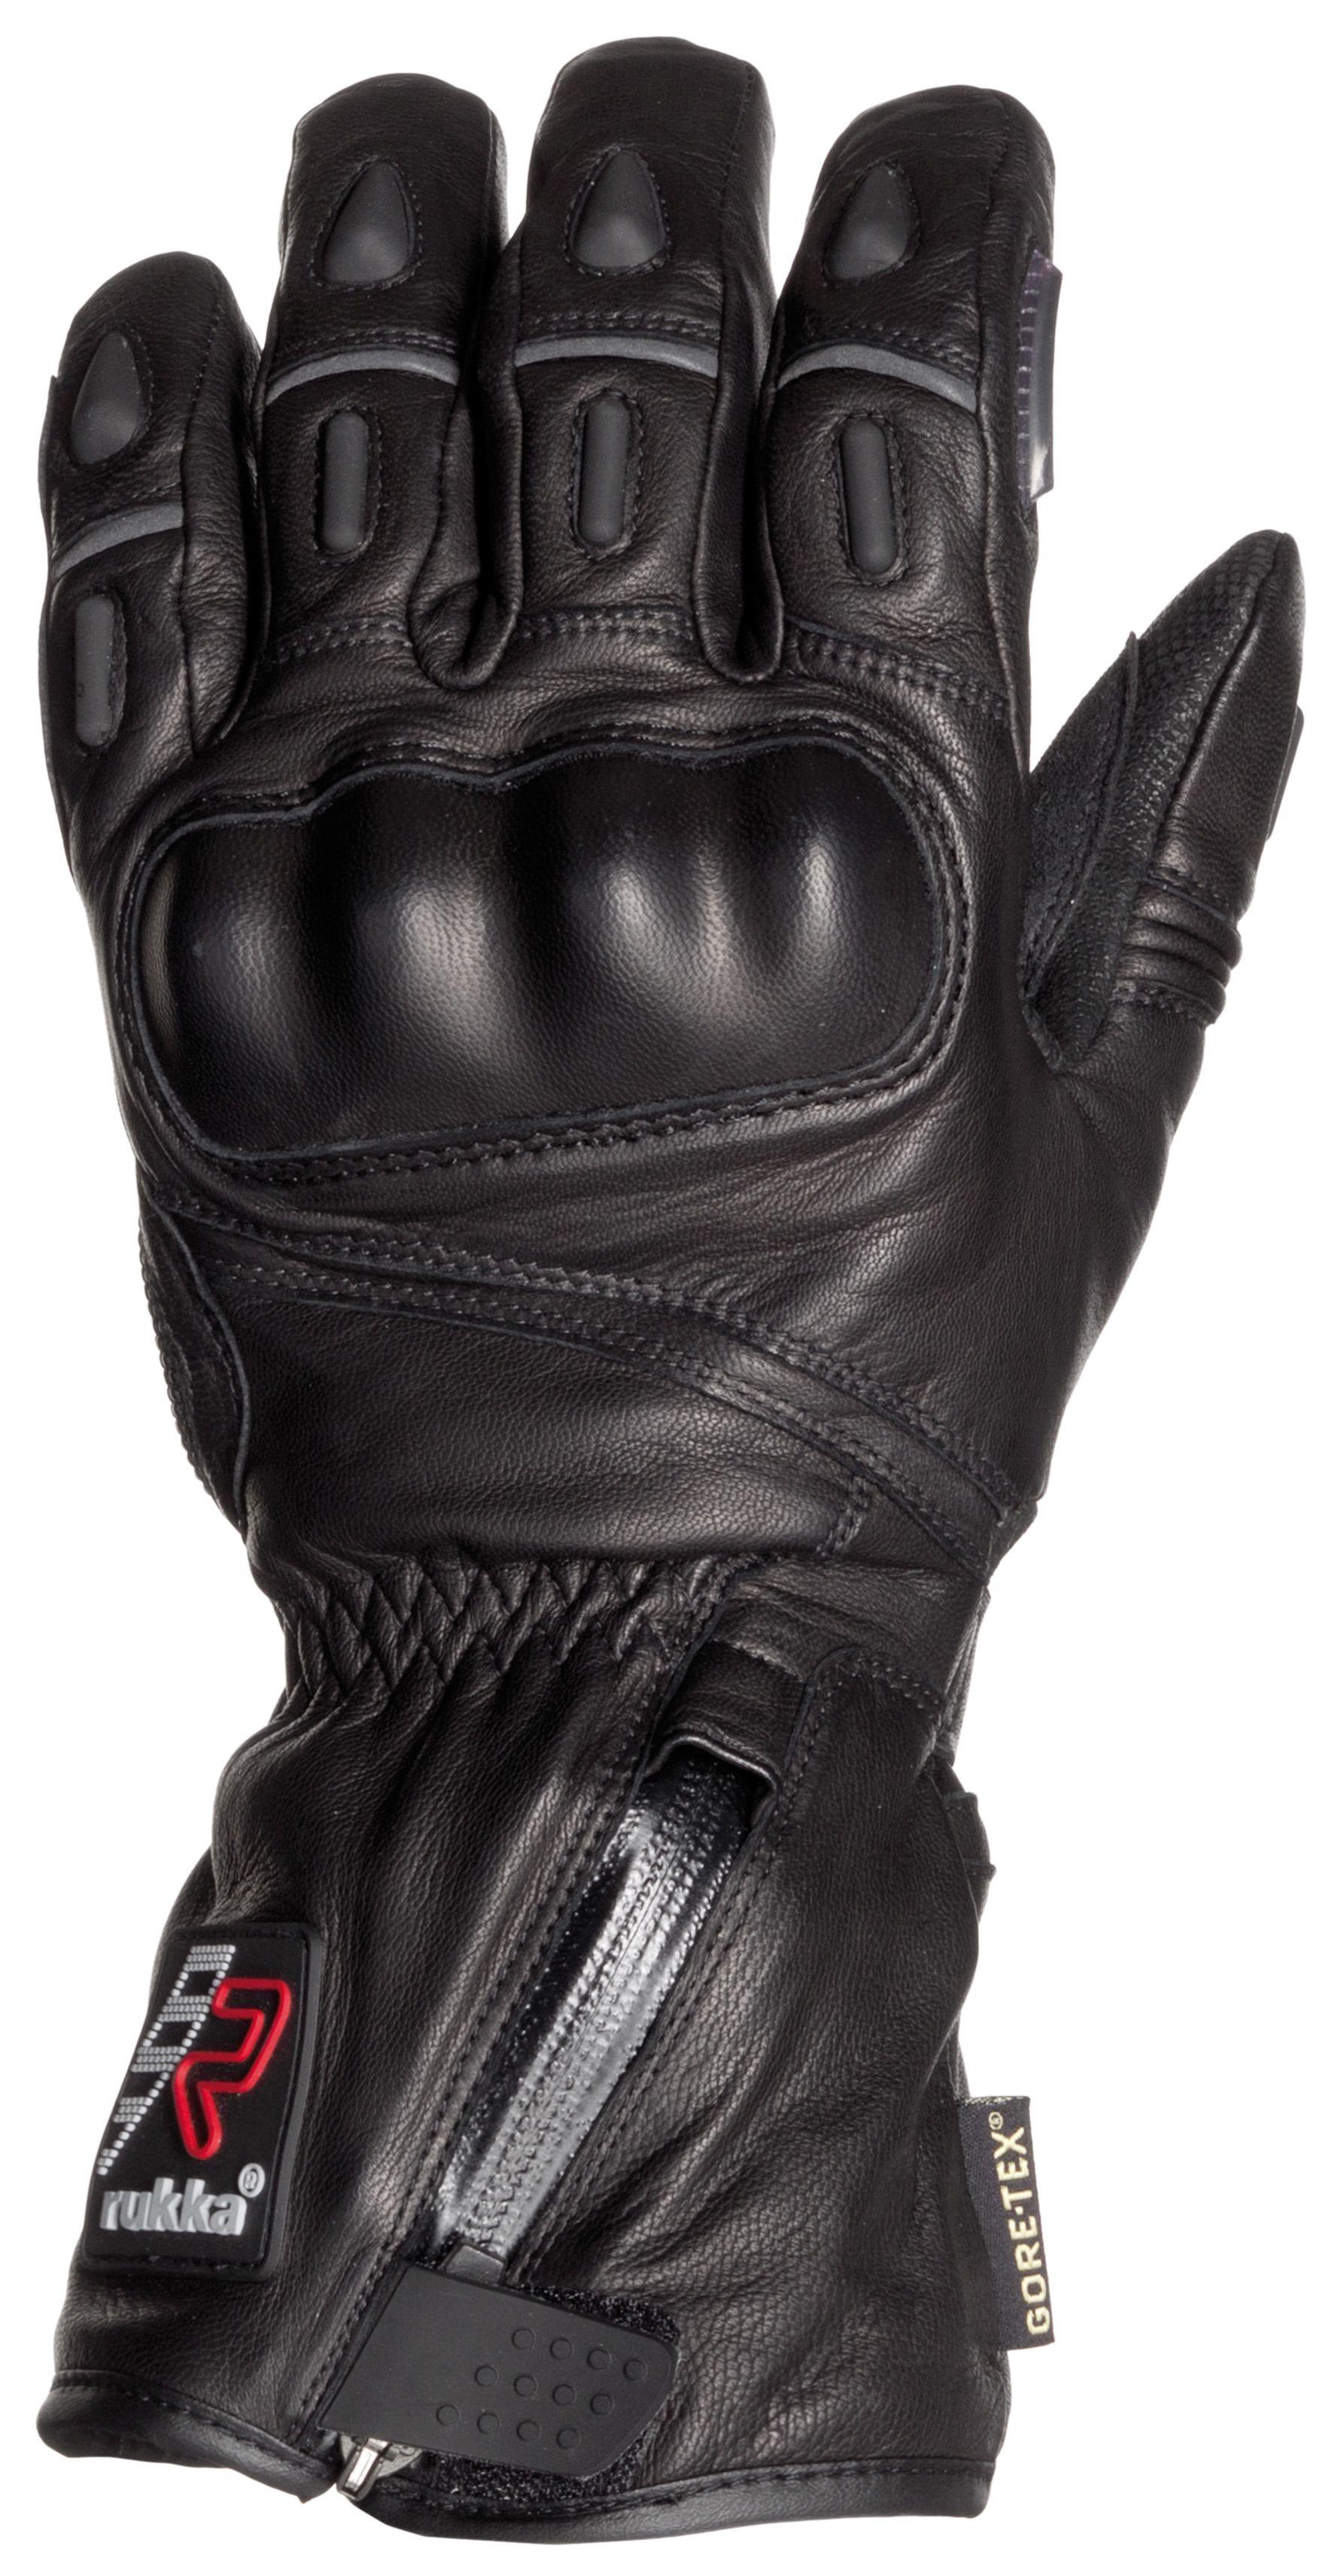 Motorcycle gloves distributor - Motorcycle Gloves Distributor 13